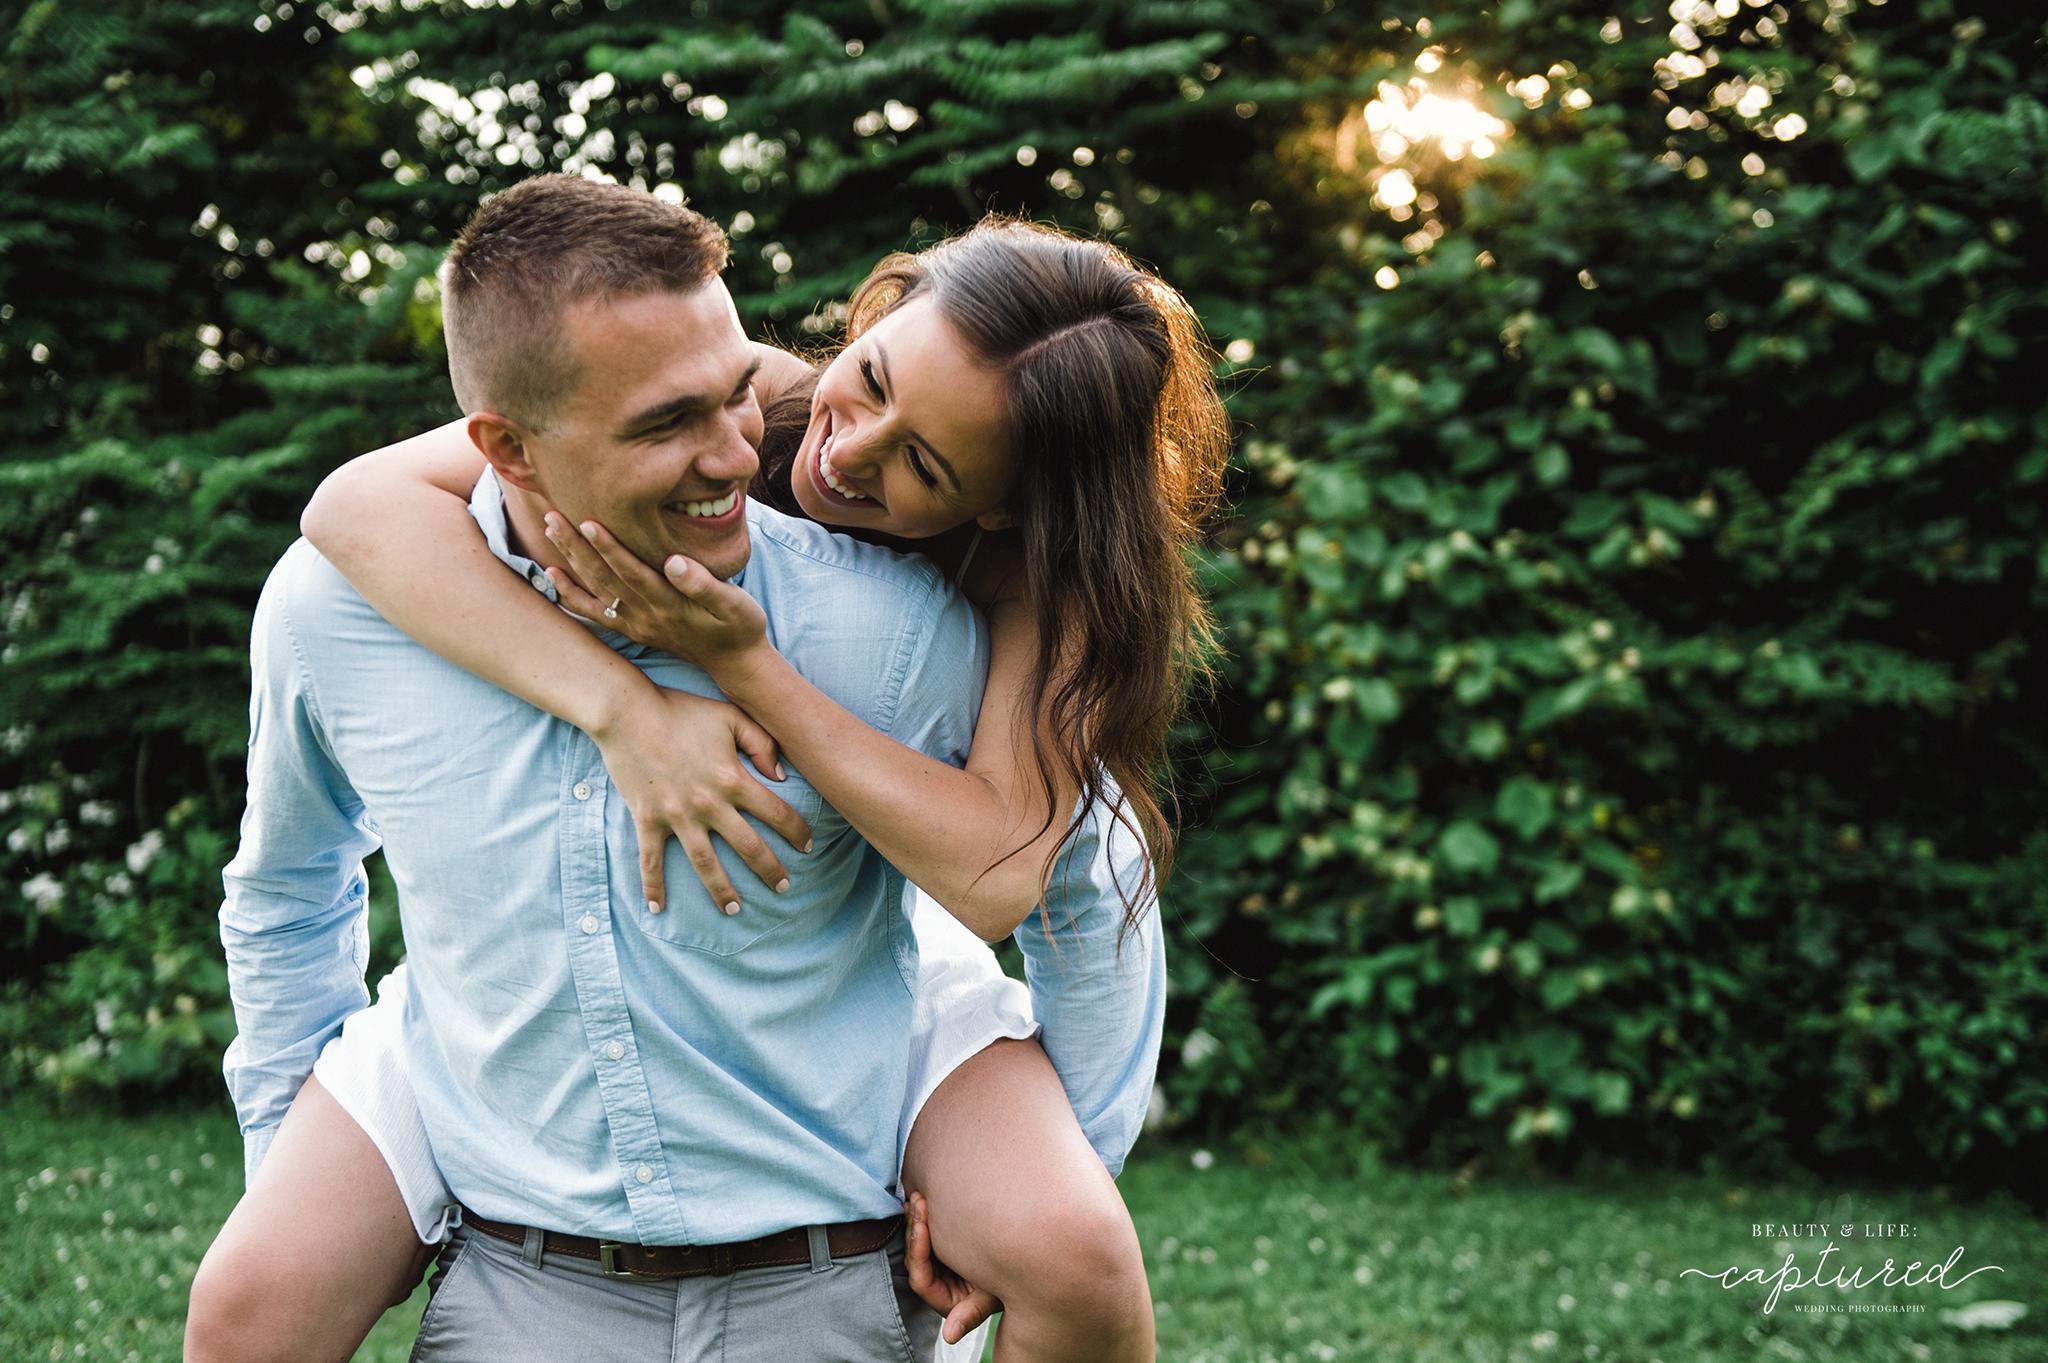 Beautyandlifecaptured_Jake_and_K_Engagement-116.jpg